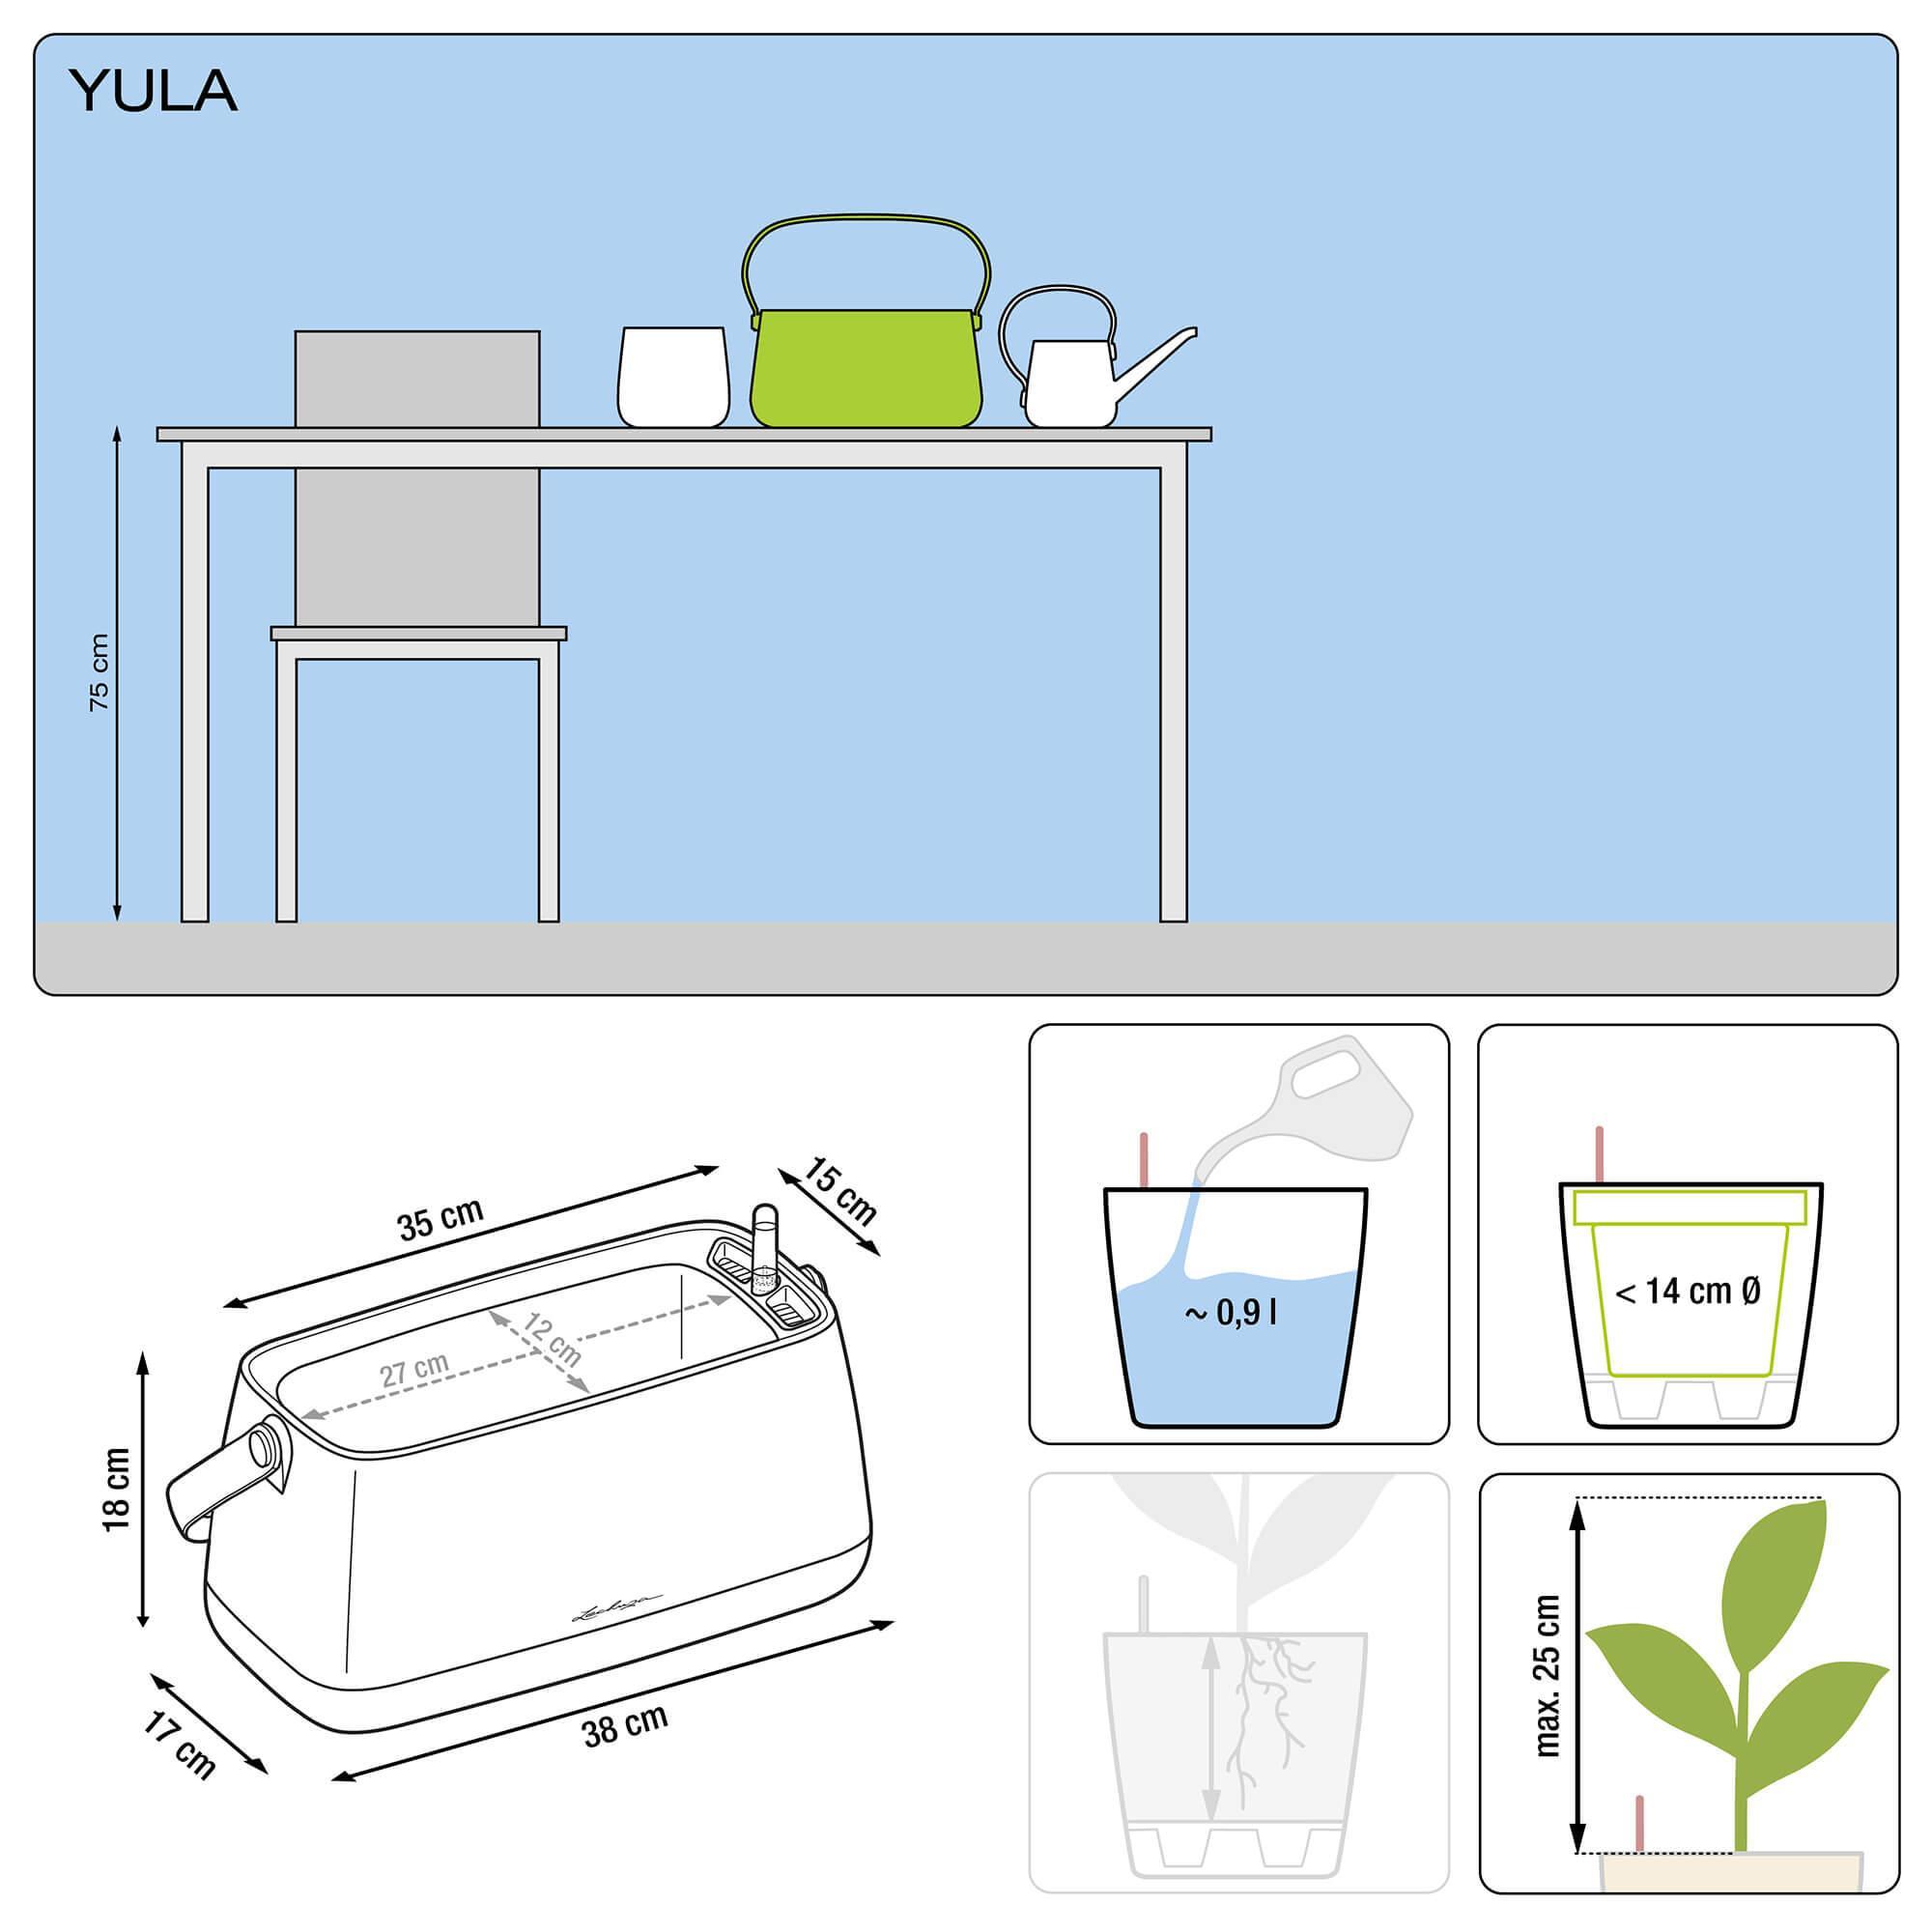 le_yula-pflanztasche_product_addi_nz